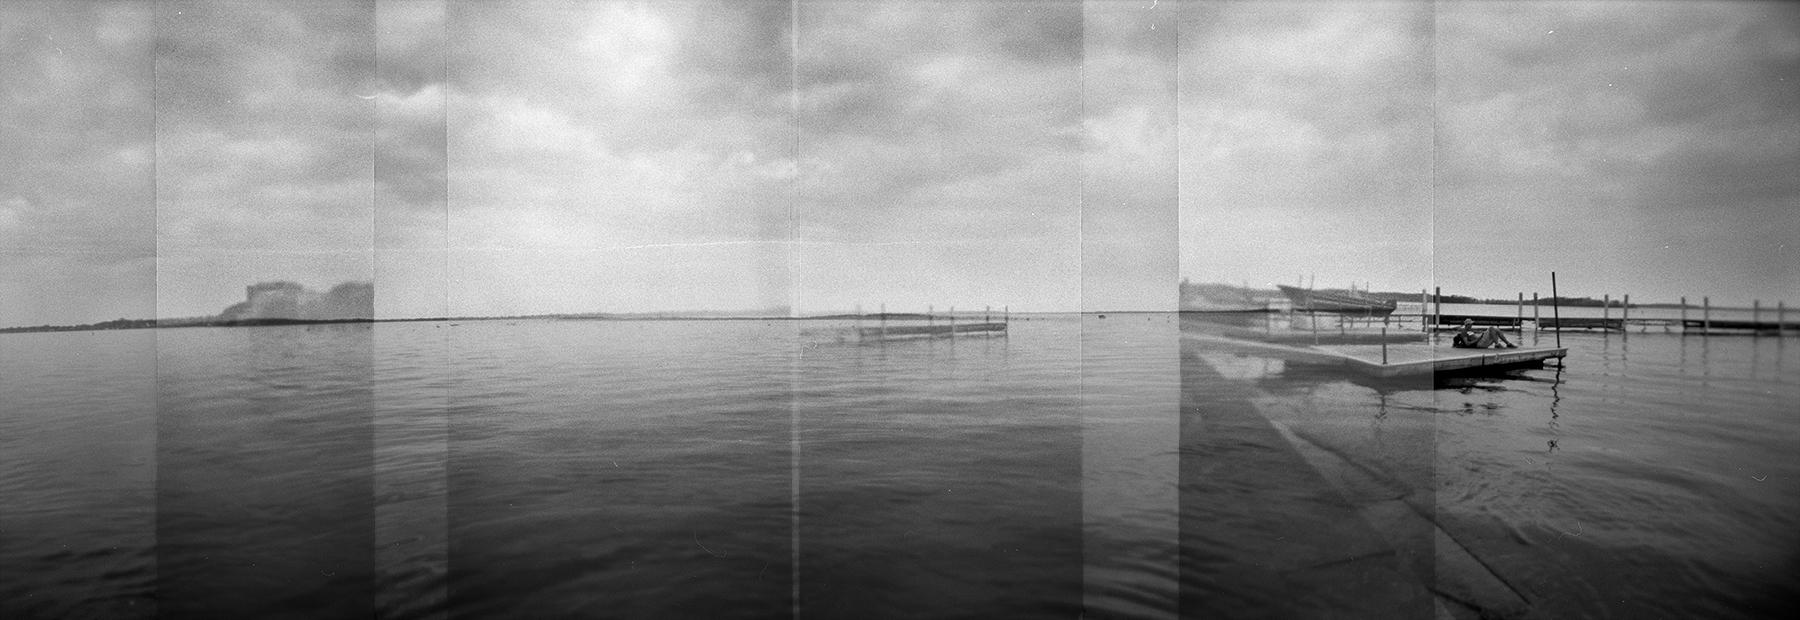 Over the Horizon   Holga 120N   Aida Ebrahimi